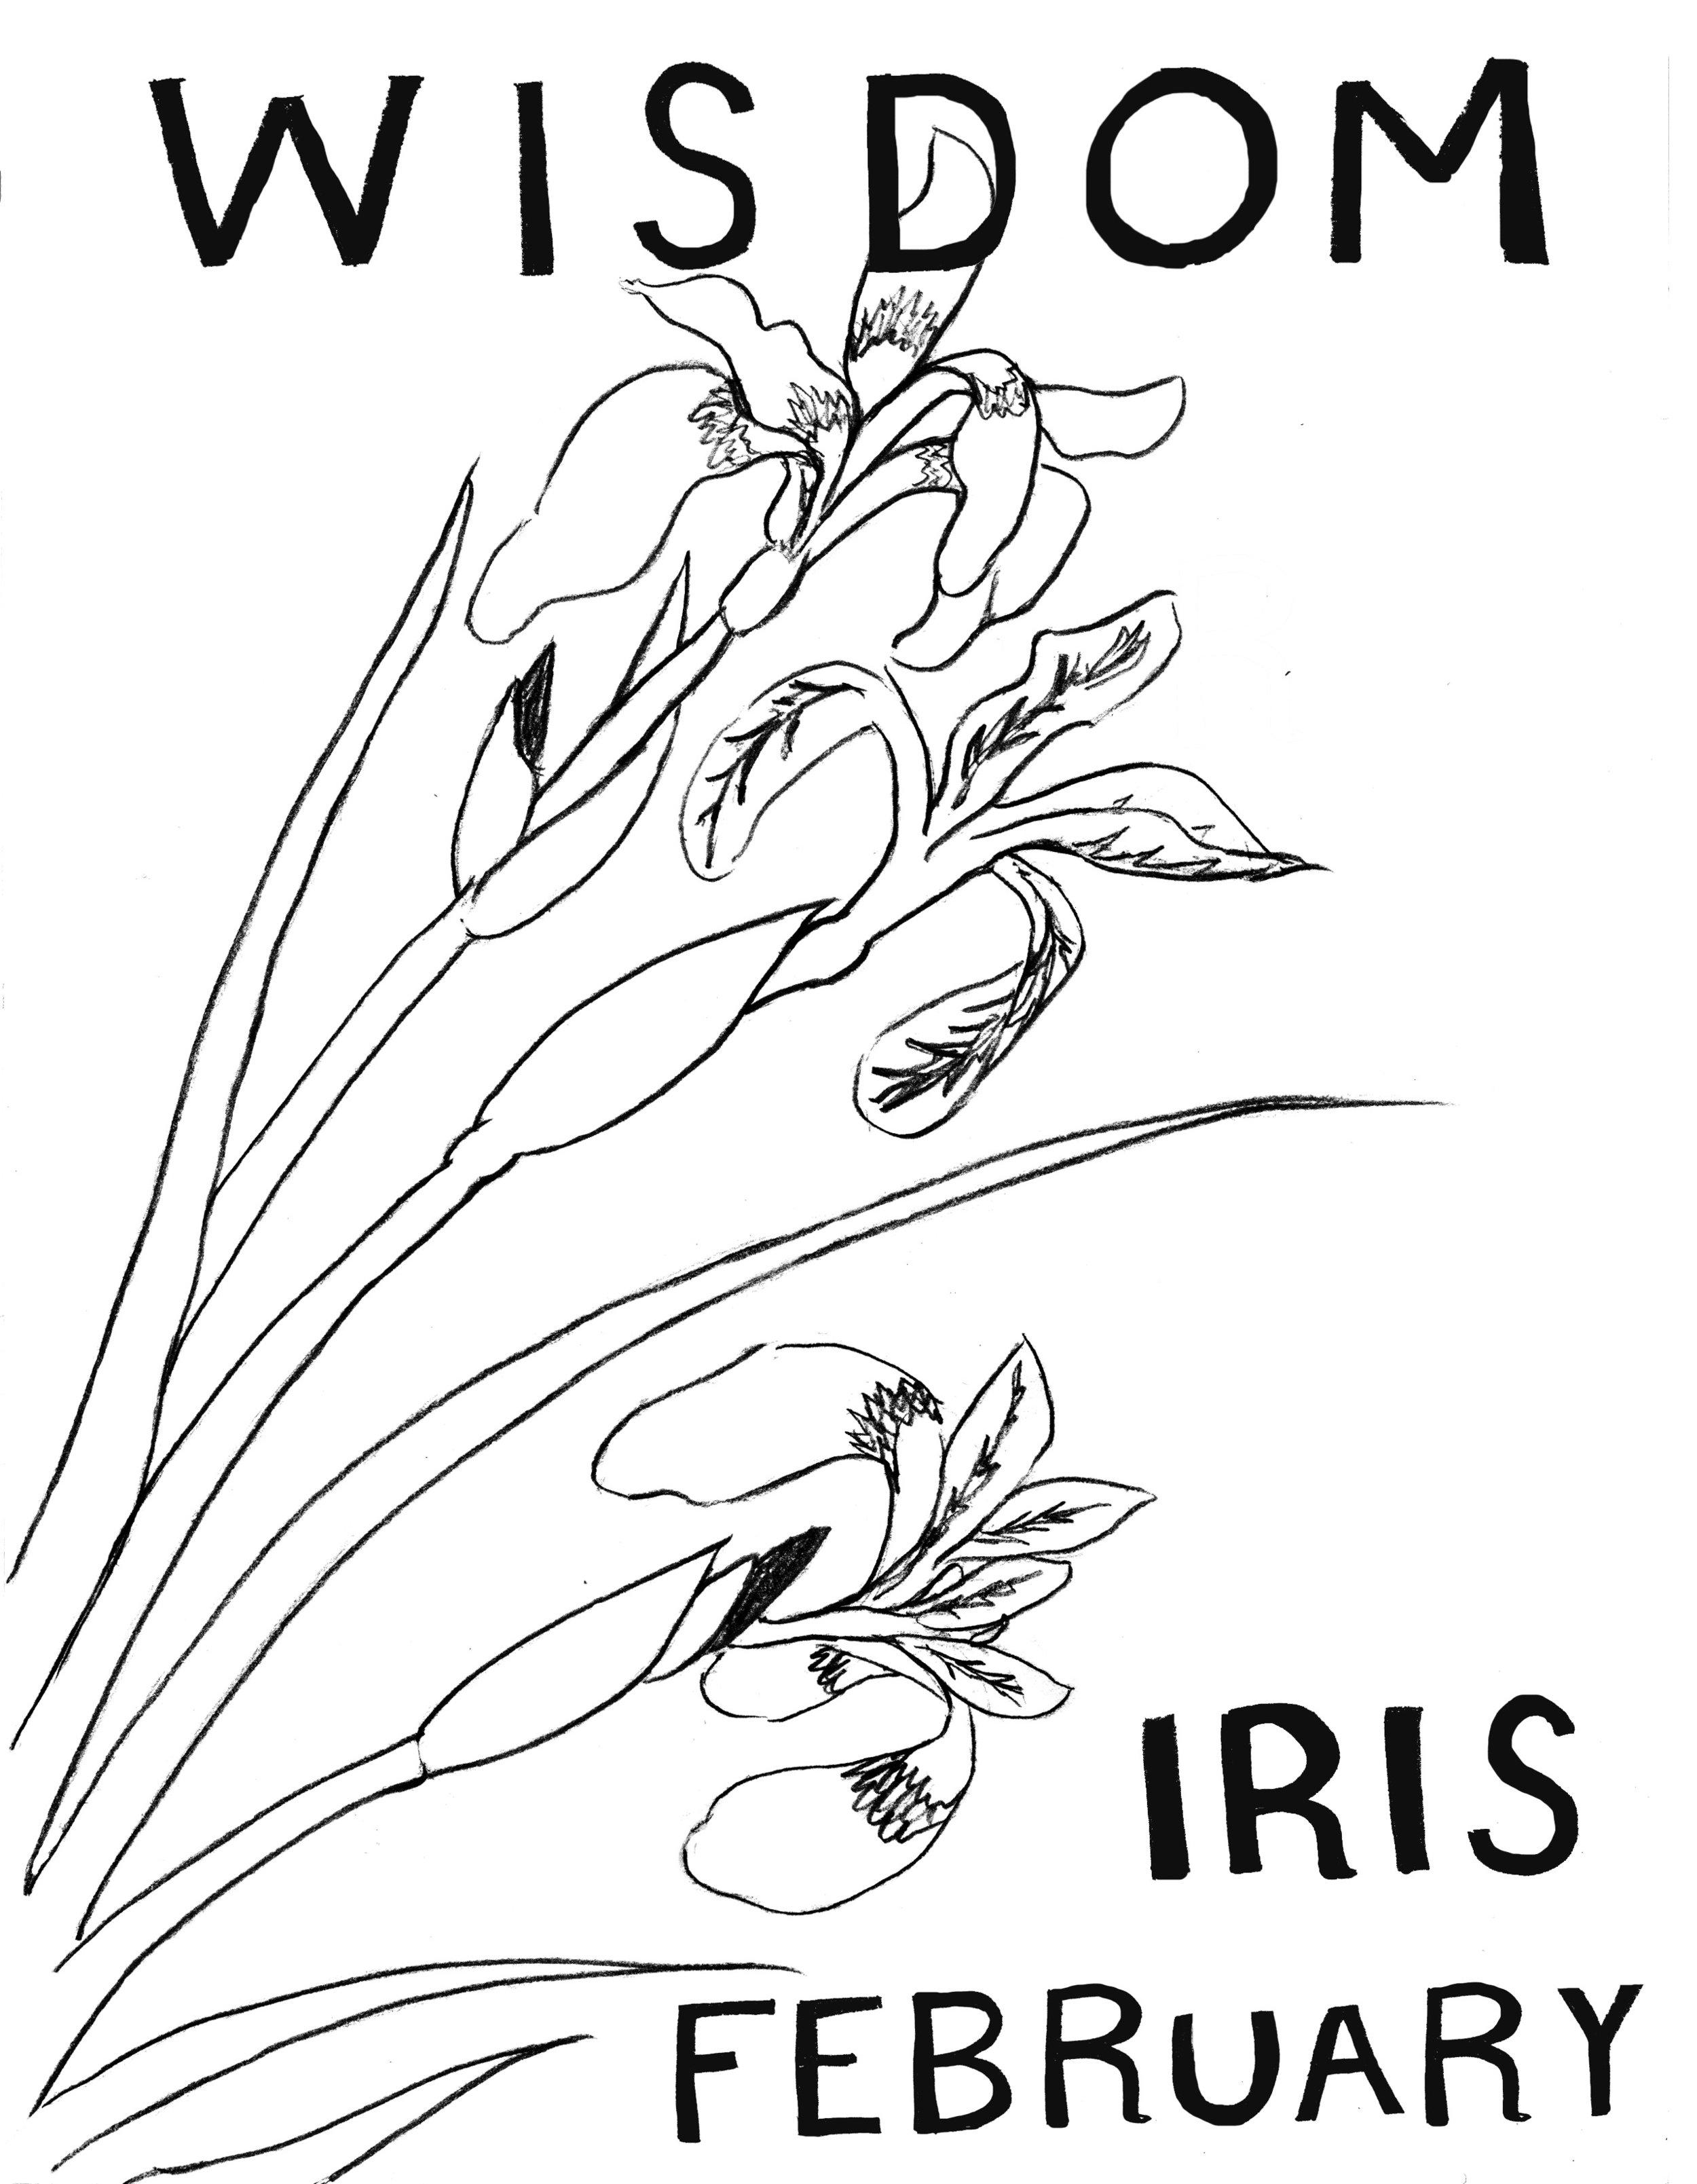 Final February Iris with words.jpg